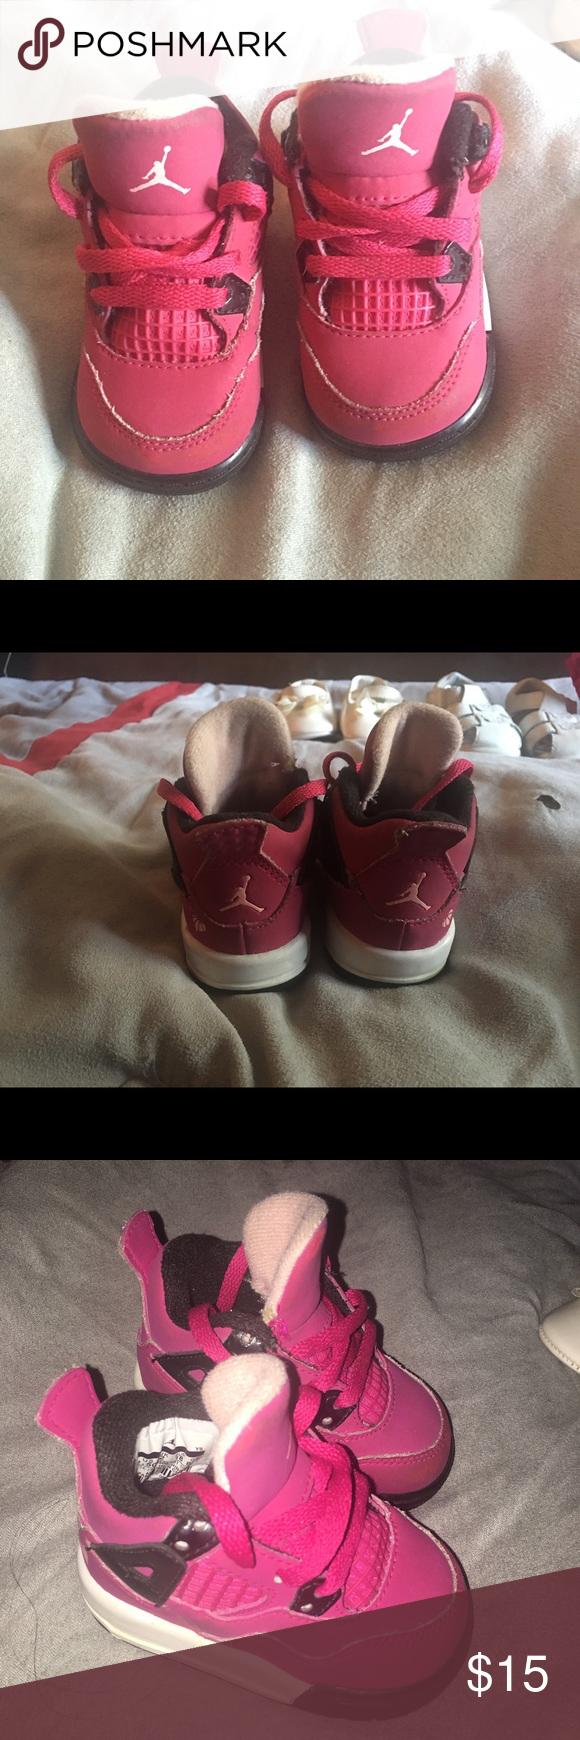 💕baby Girl Jordans! In good used